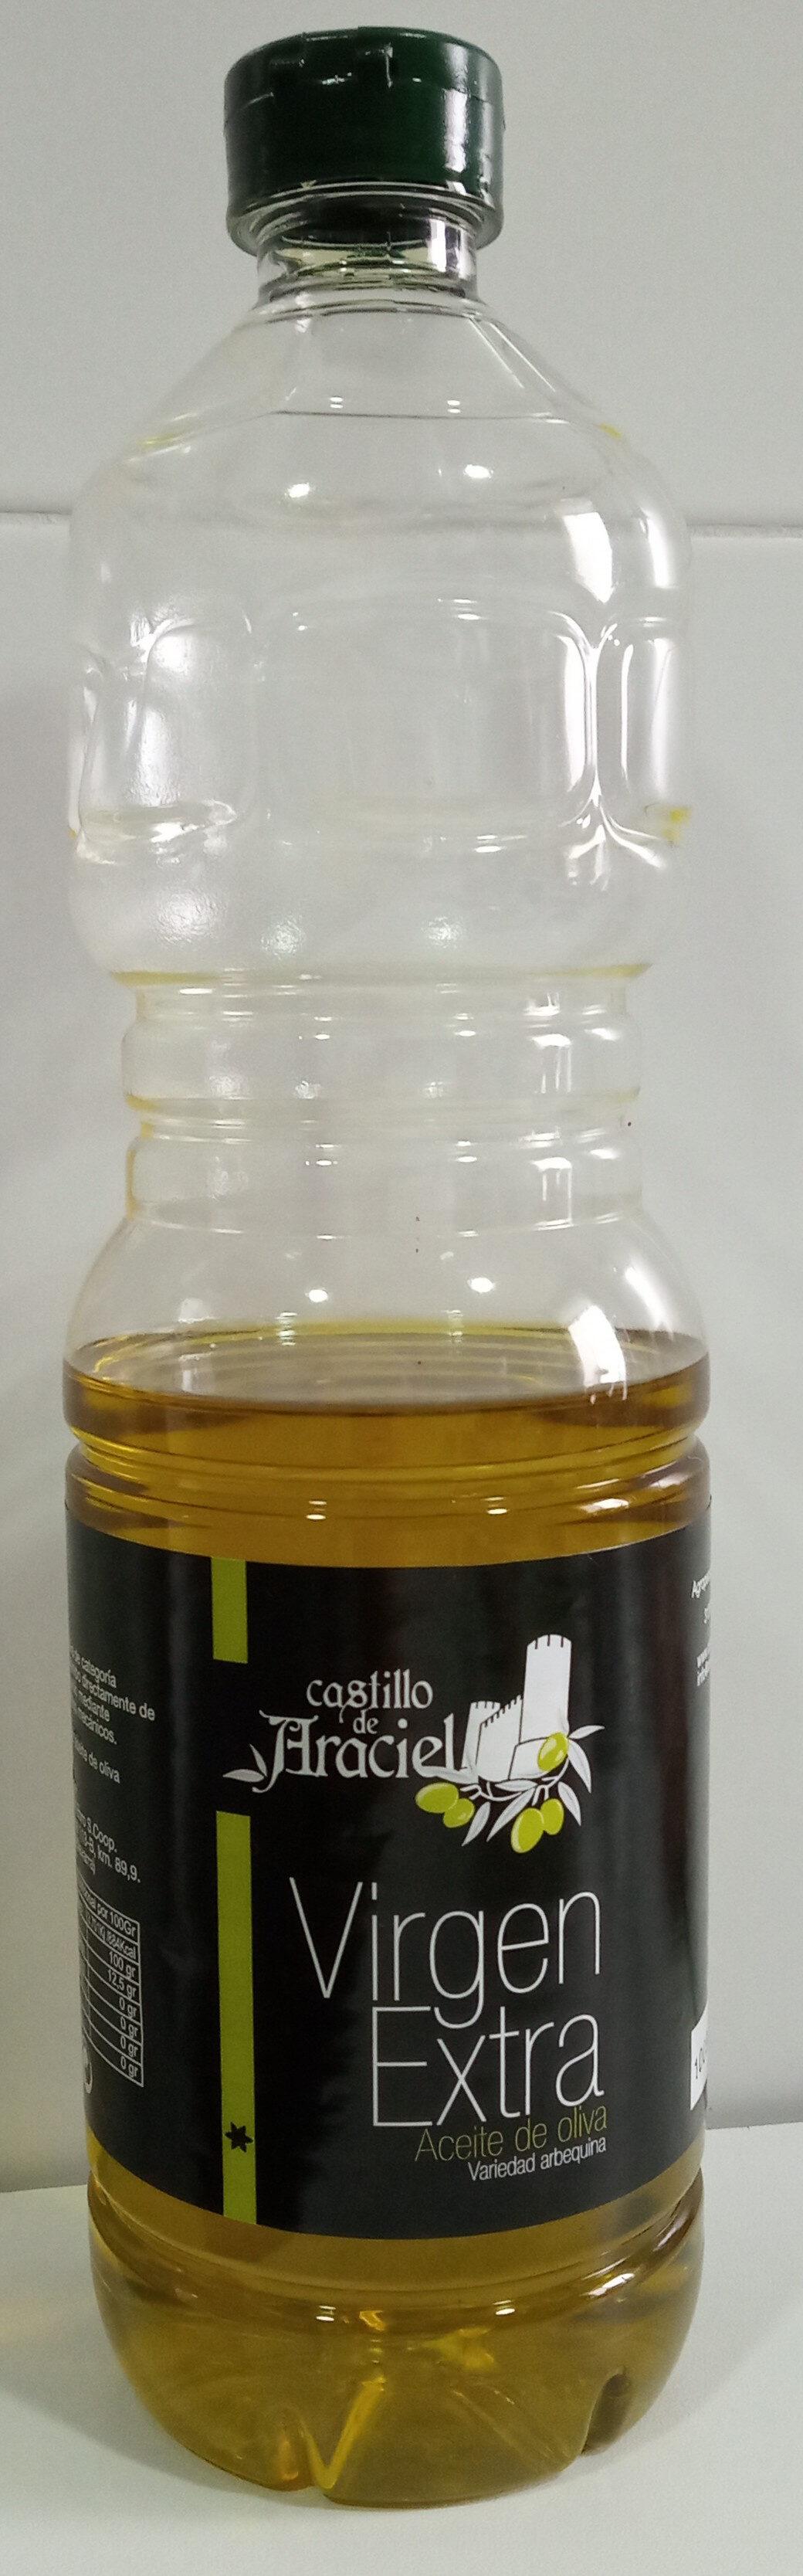 Aceite de oliva Virgen Extra Variedad arbequina - Product - es